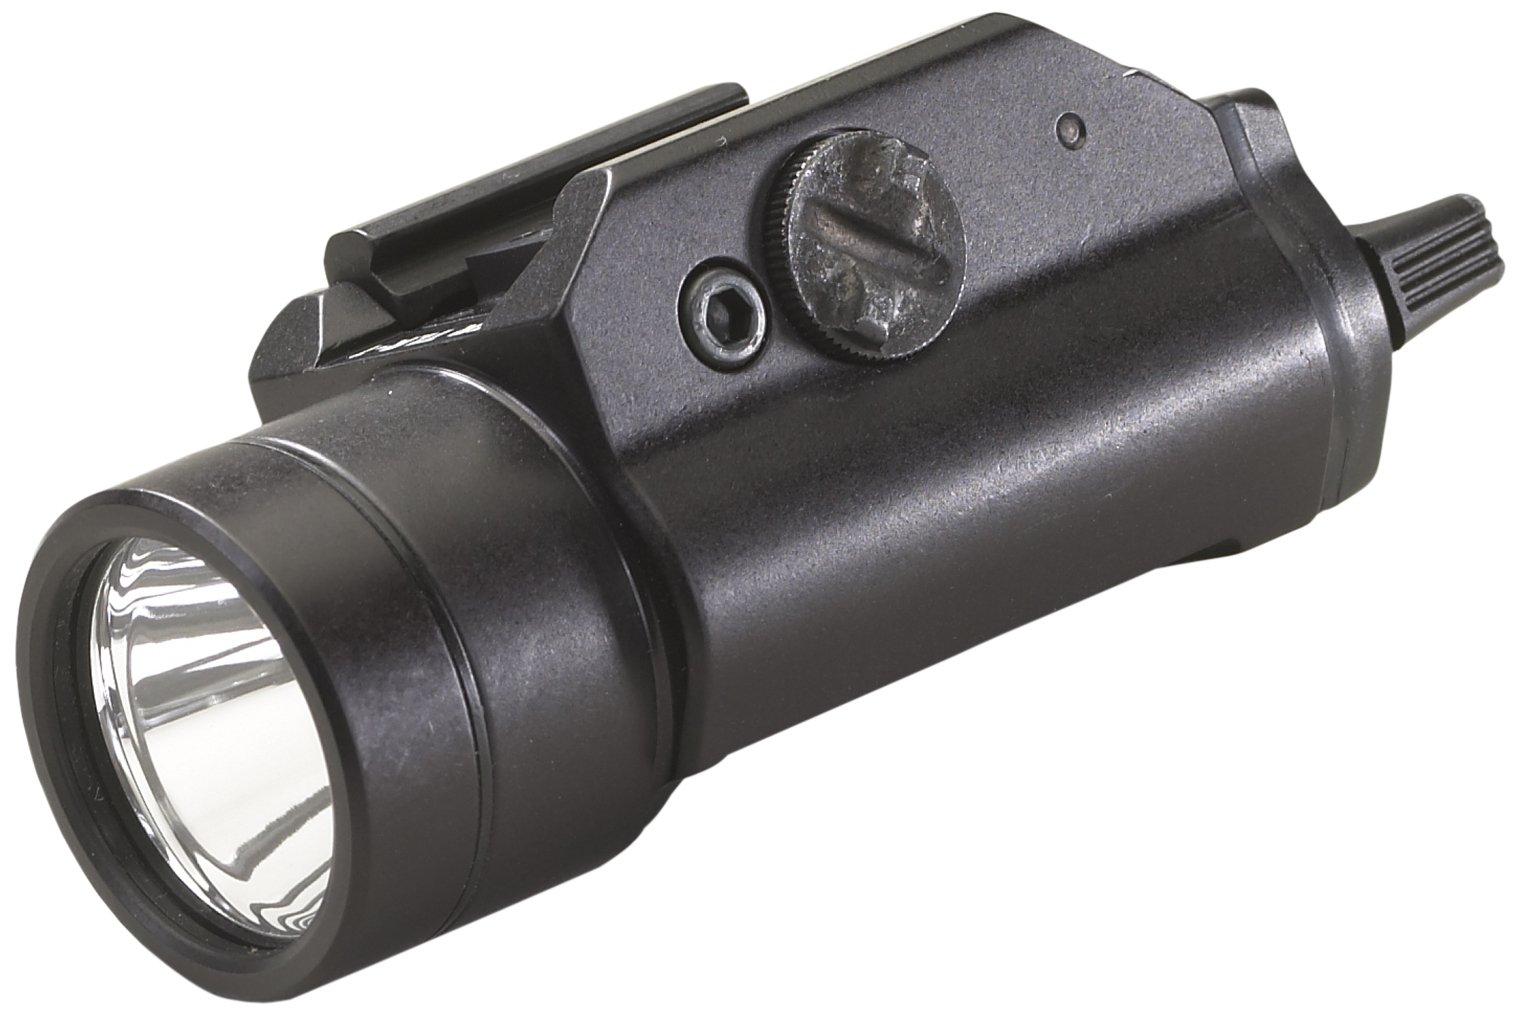 Streamlight TLR-1 IR CR123A Lithium Batteries 125mW 69150 Tactical Light IPX7